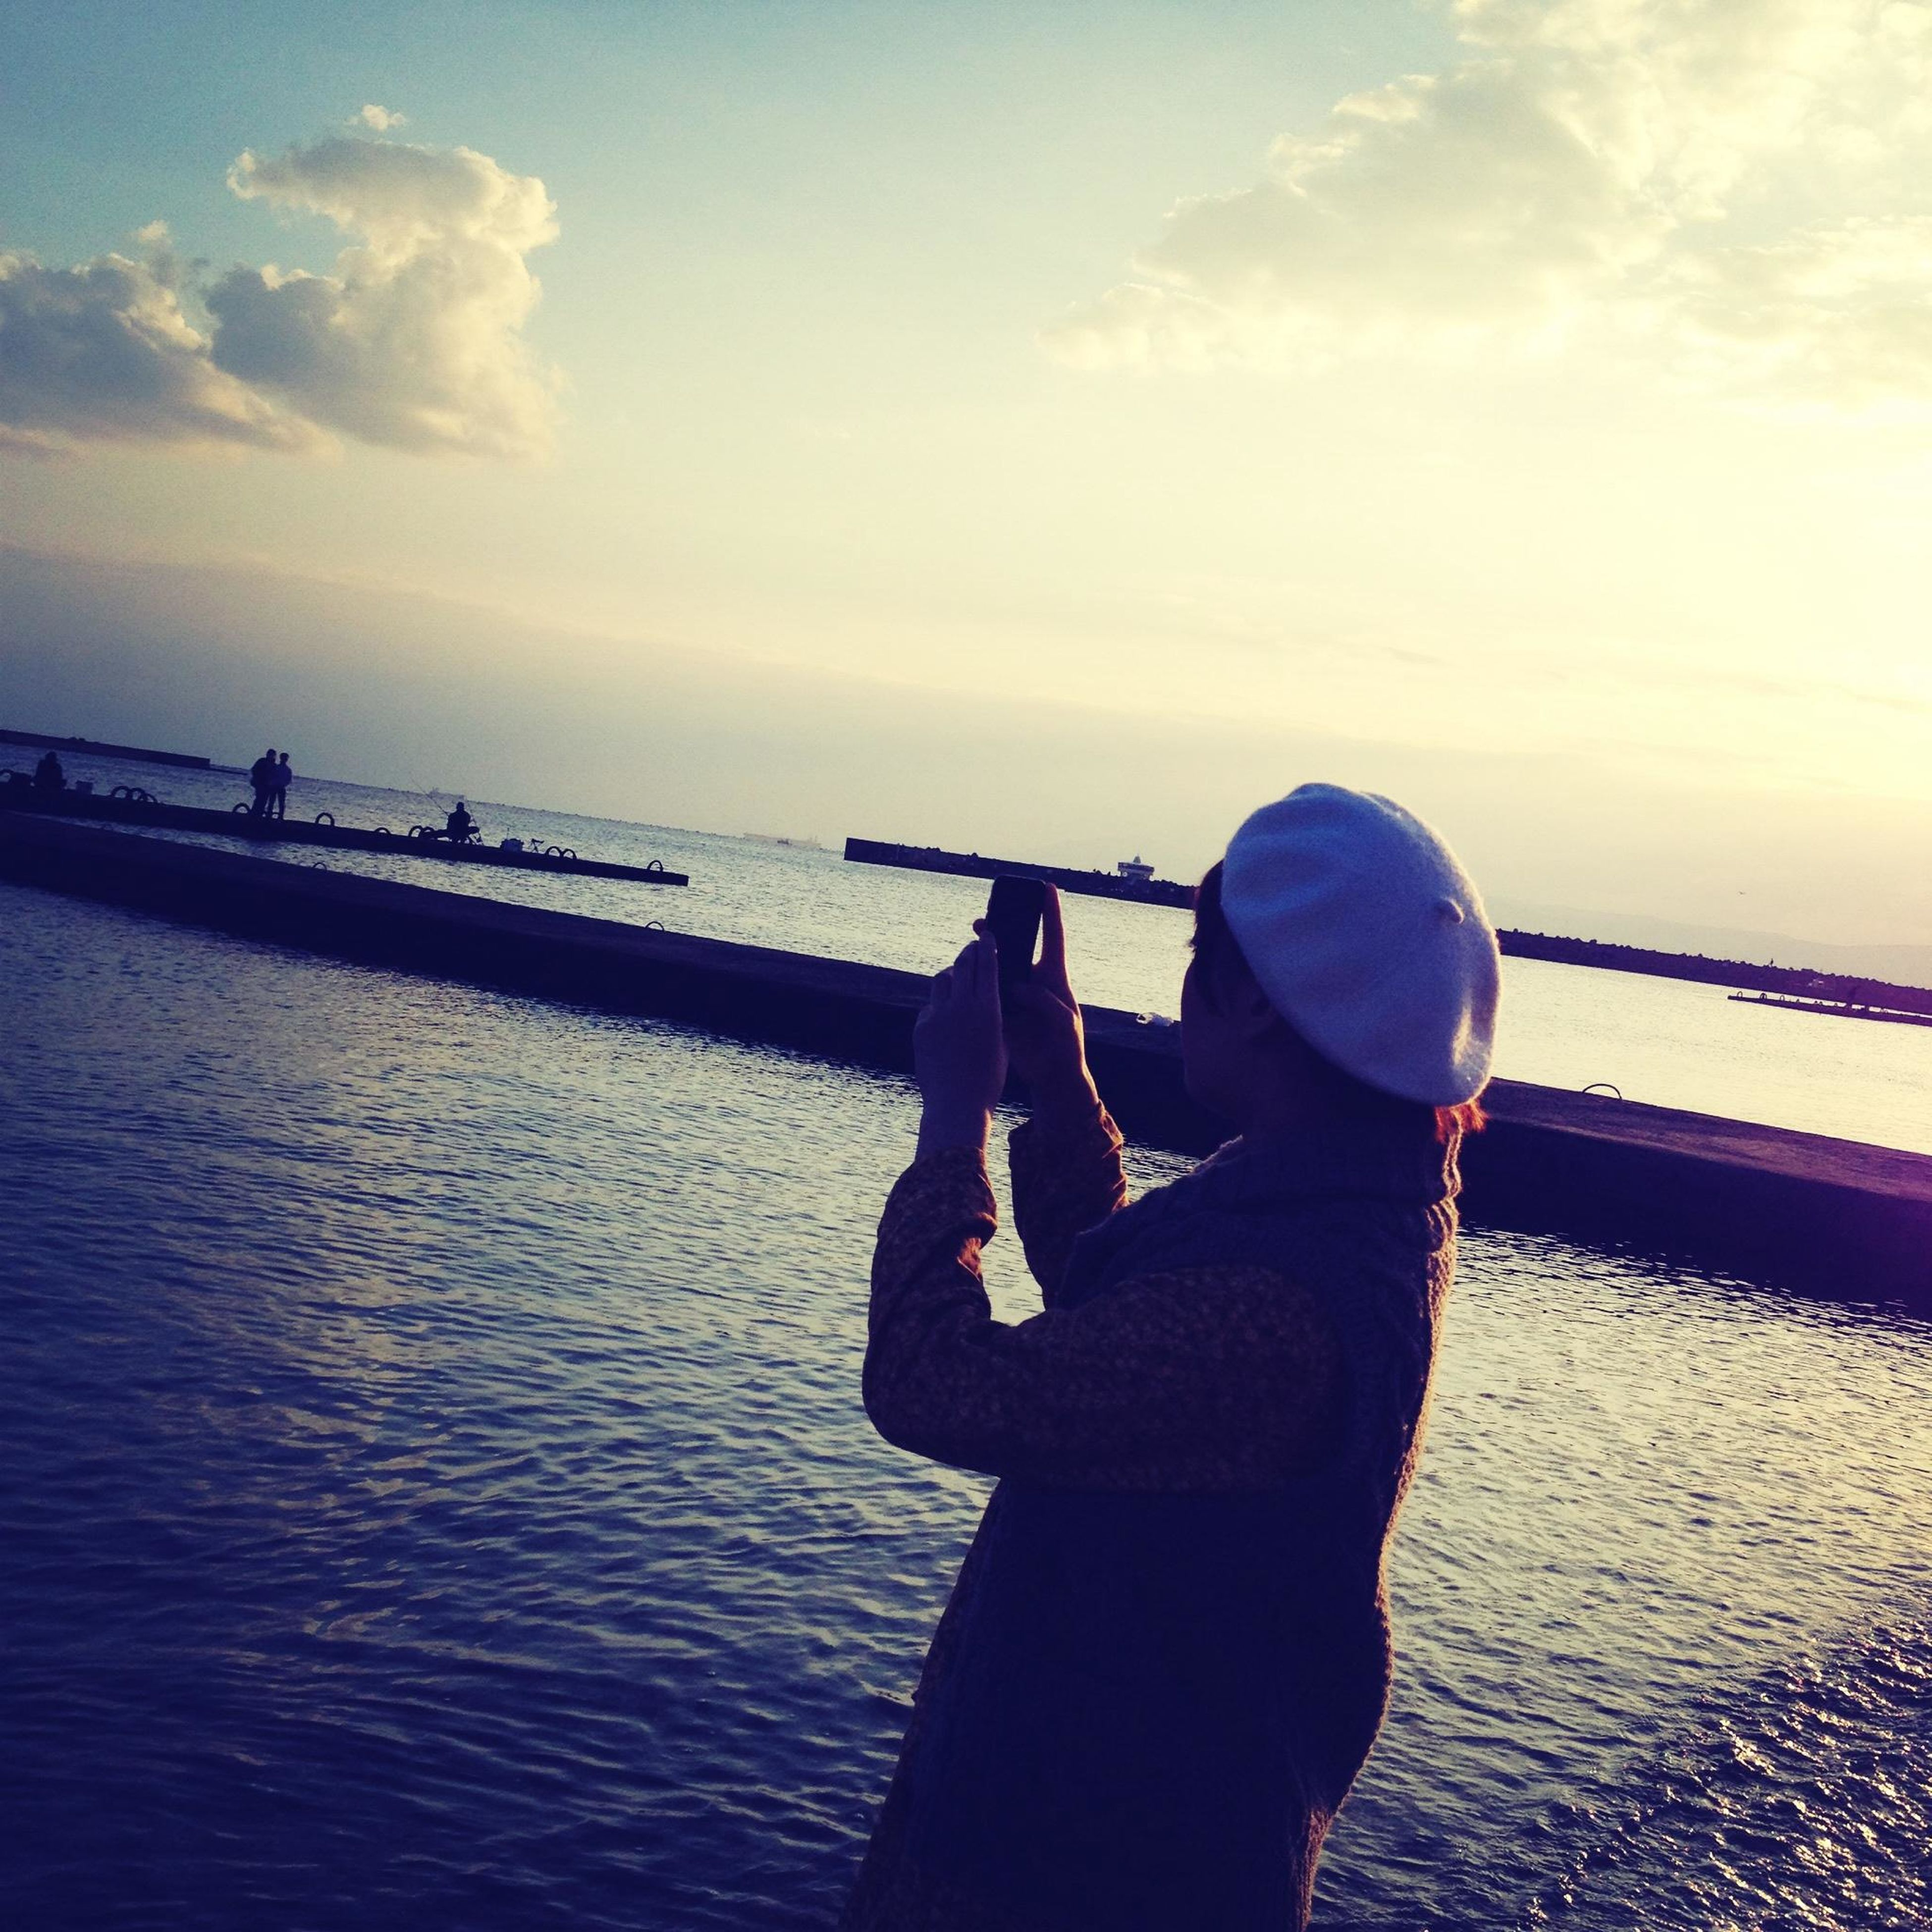 sea, water, sky, lifestyles, leisure activity, rear view, men, horizon over water, cloud - sky, railing, standing, cloud, transportation, nautical vessel, full length, pier, nature